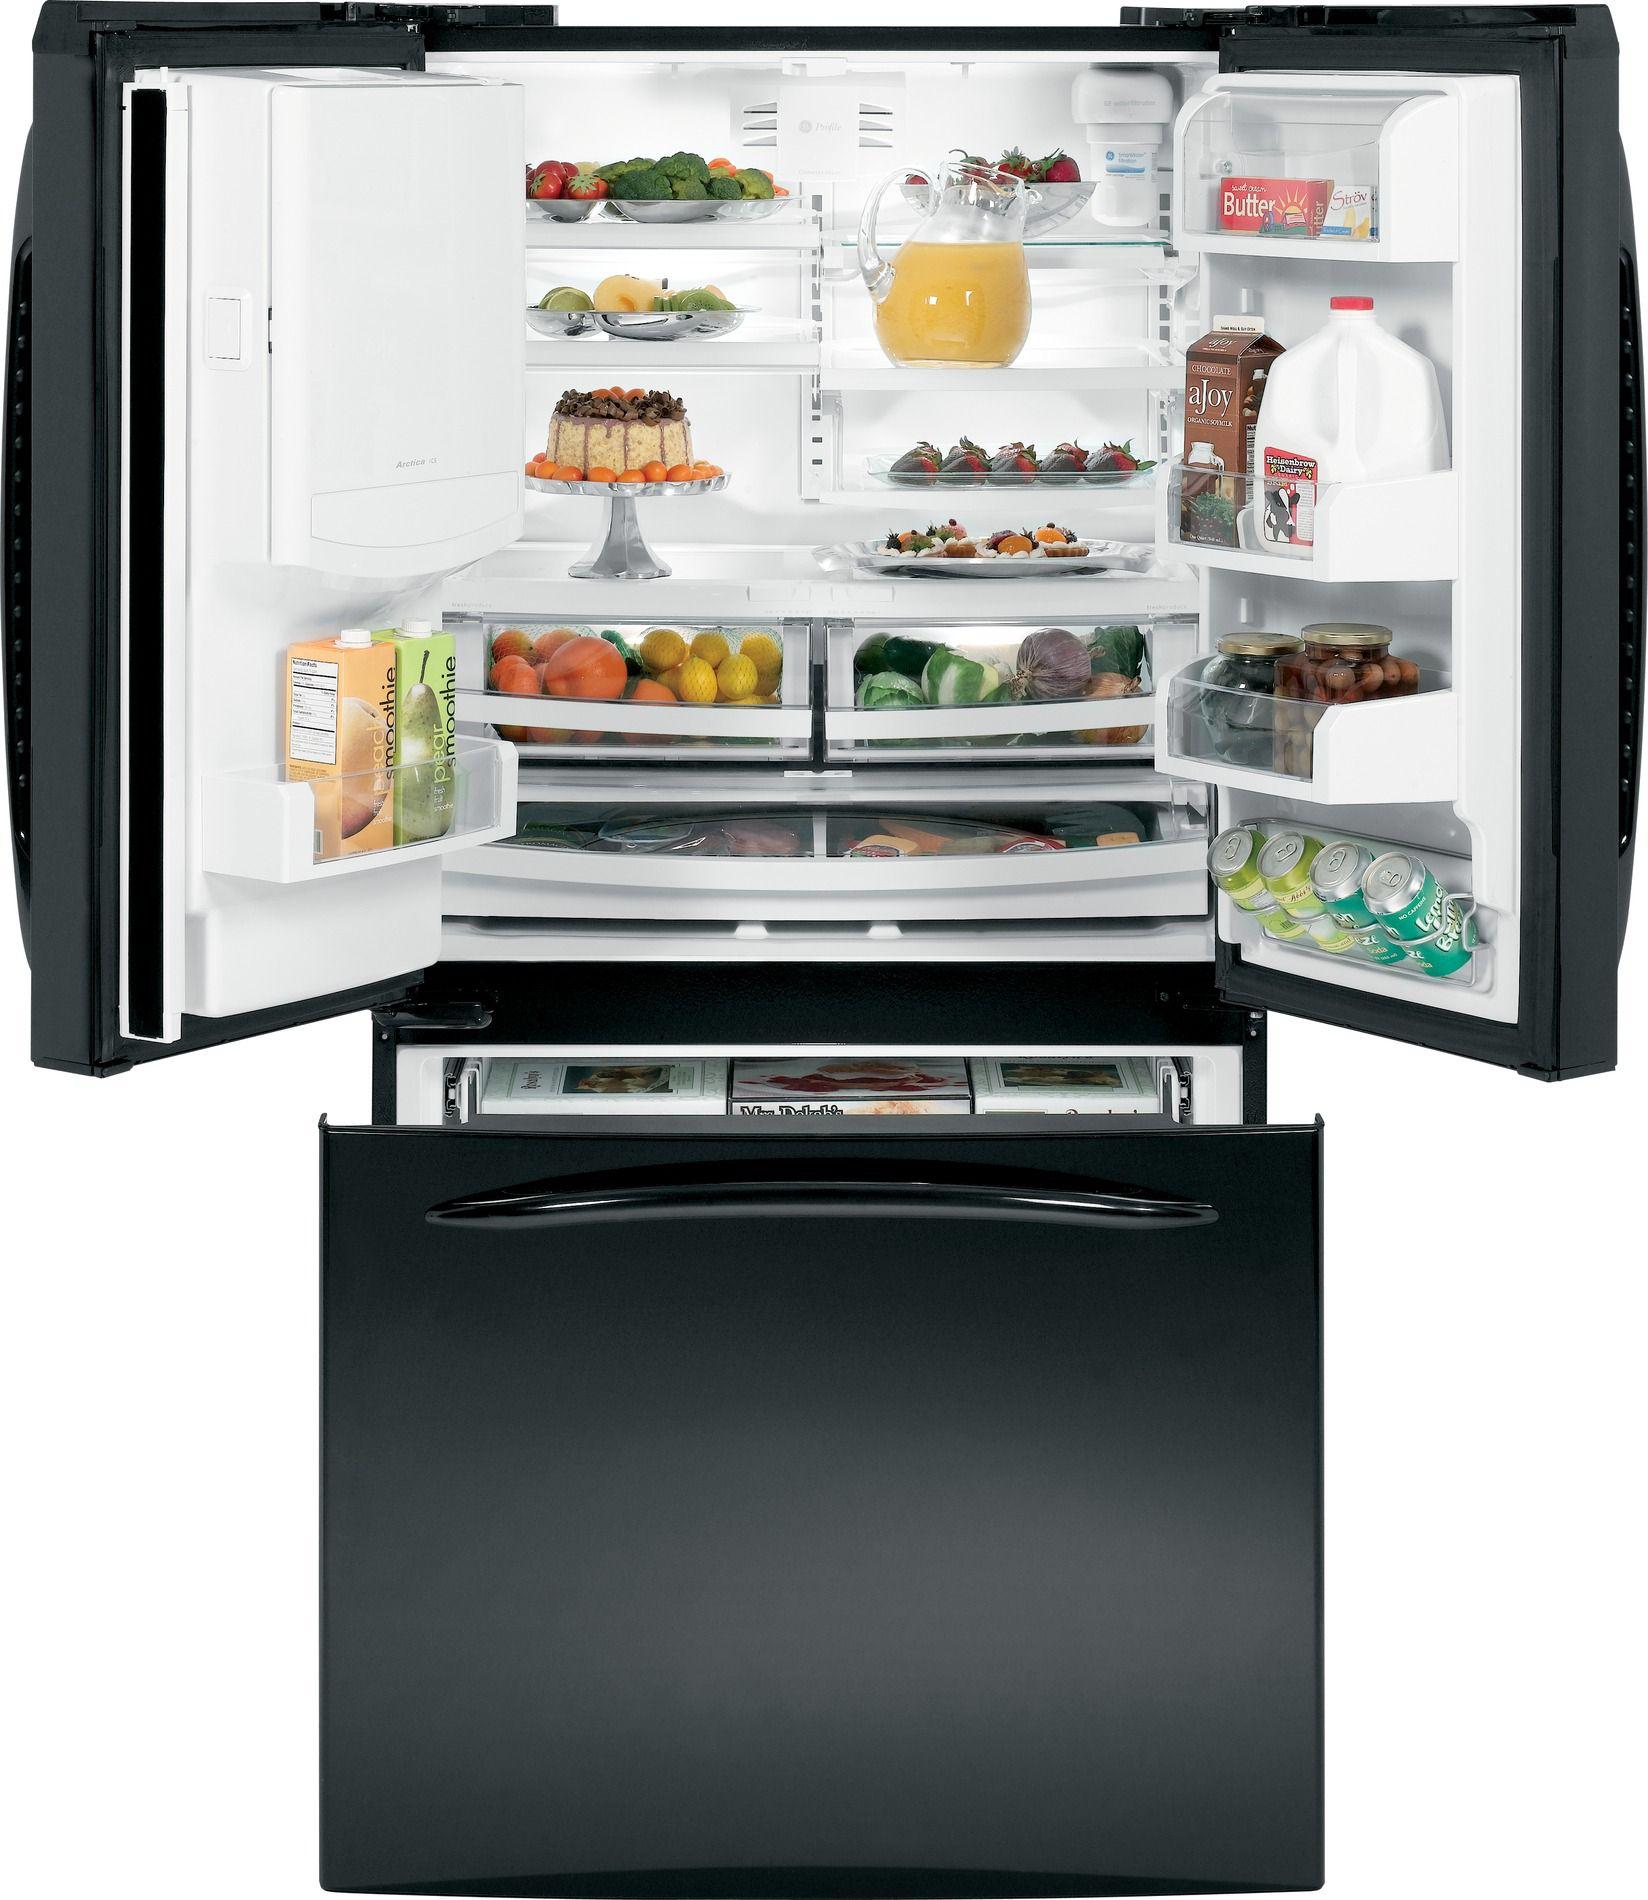 GE Profile™ Series 25.1 cu. ft. French Door Bottom-Freezer Refrigerator Black